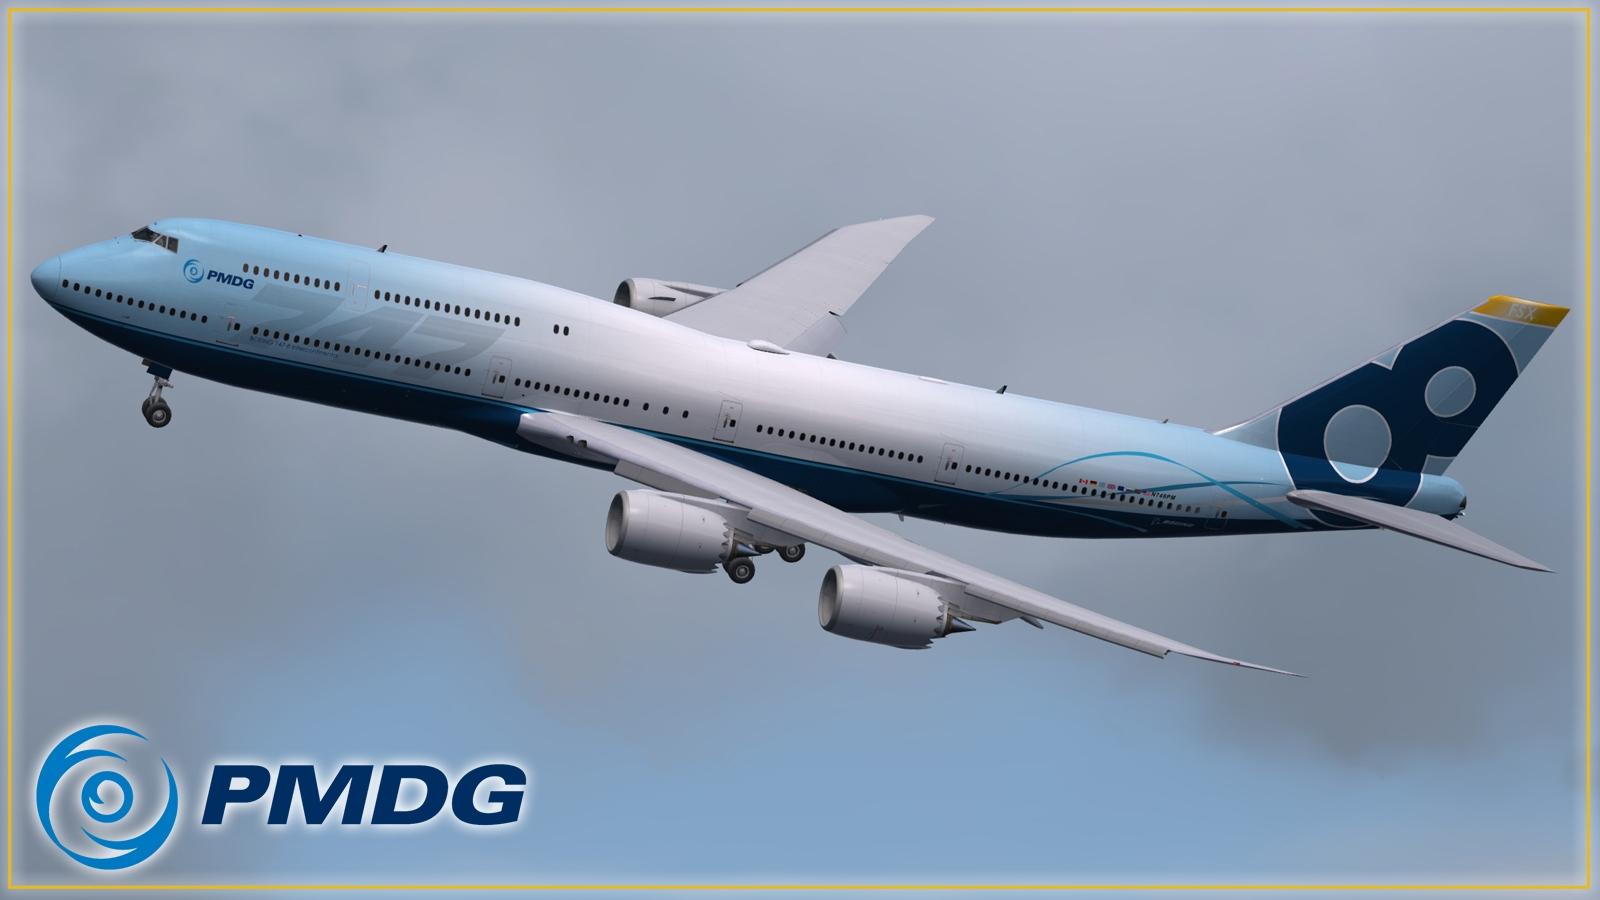 PMDG_748_flyby.jpg